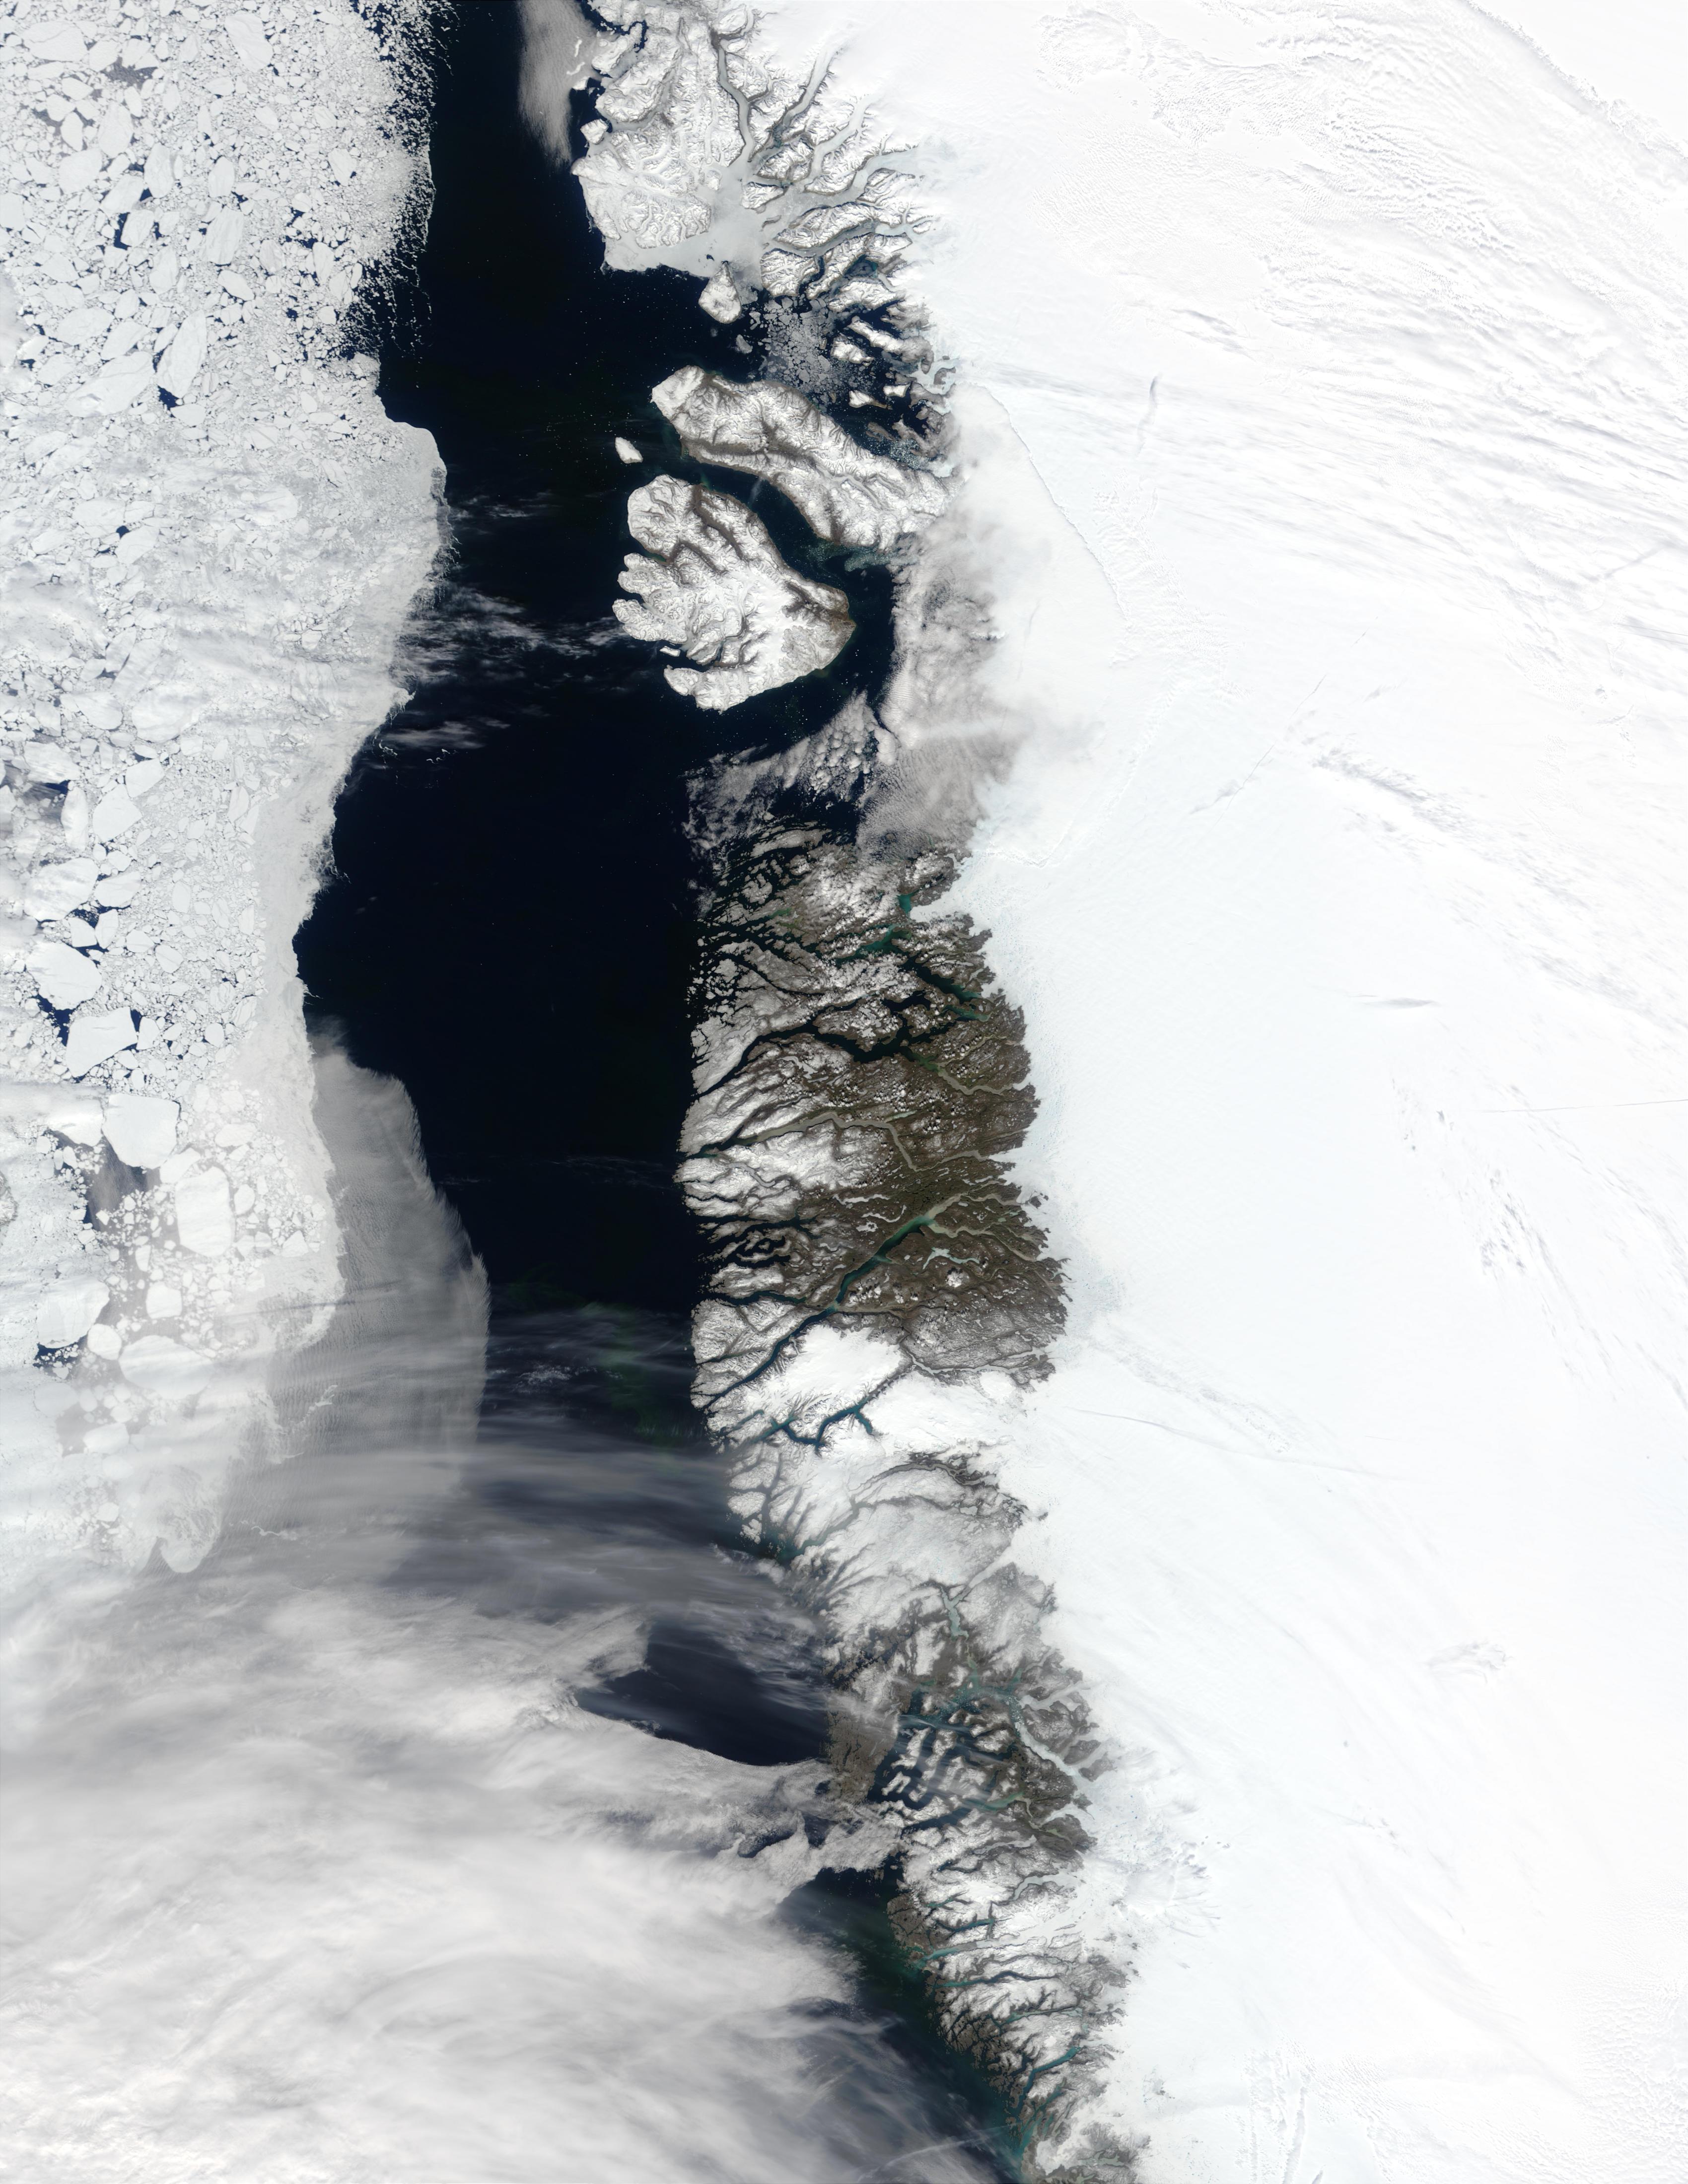 Costa oeste de Groenlandia